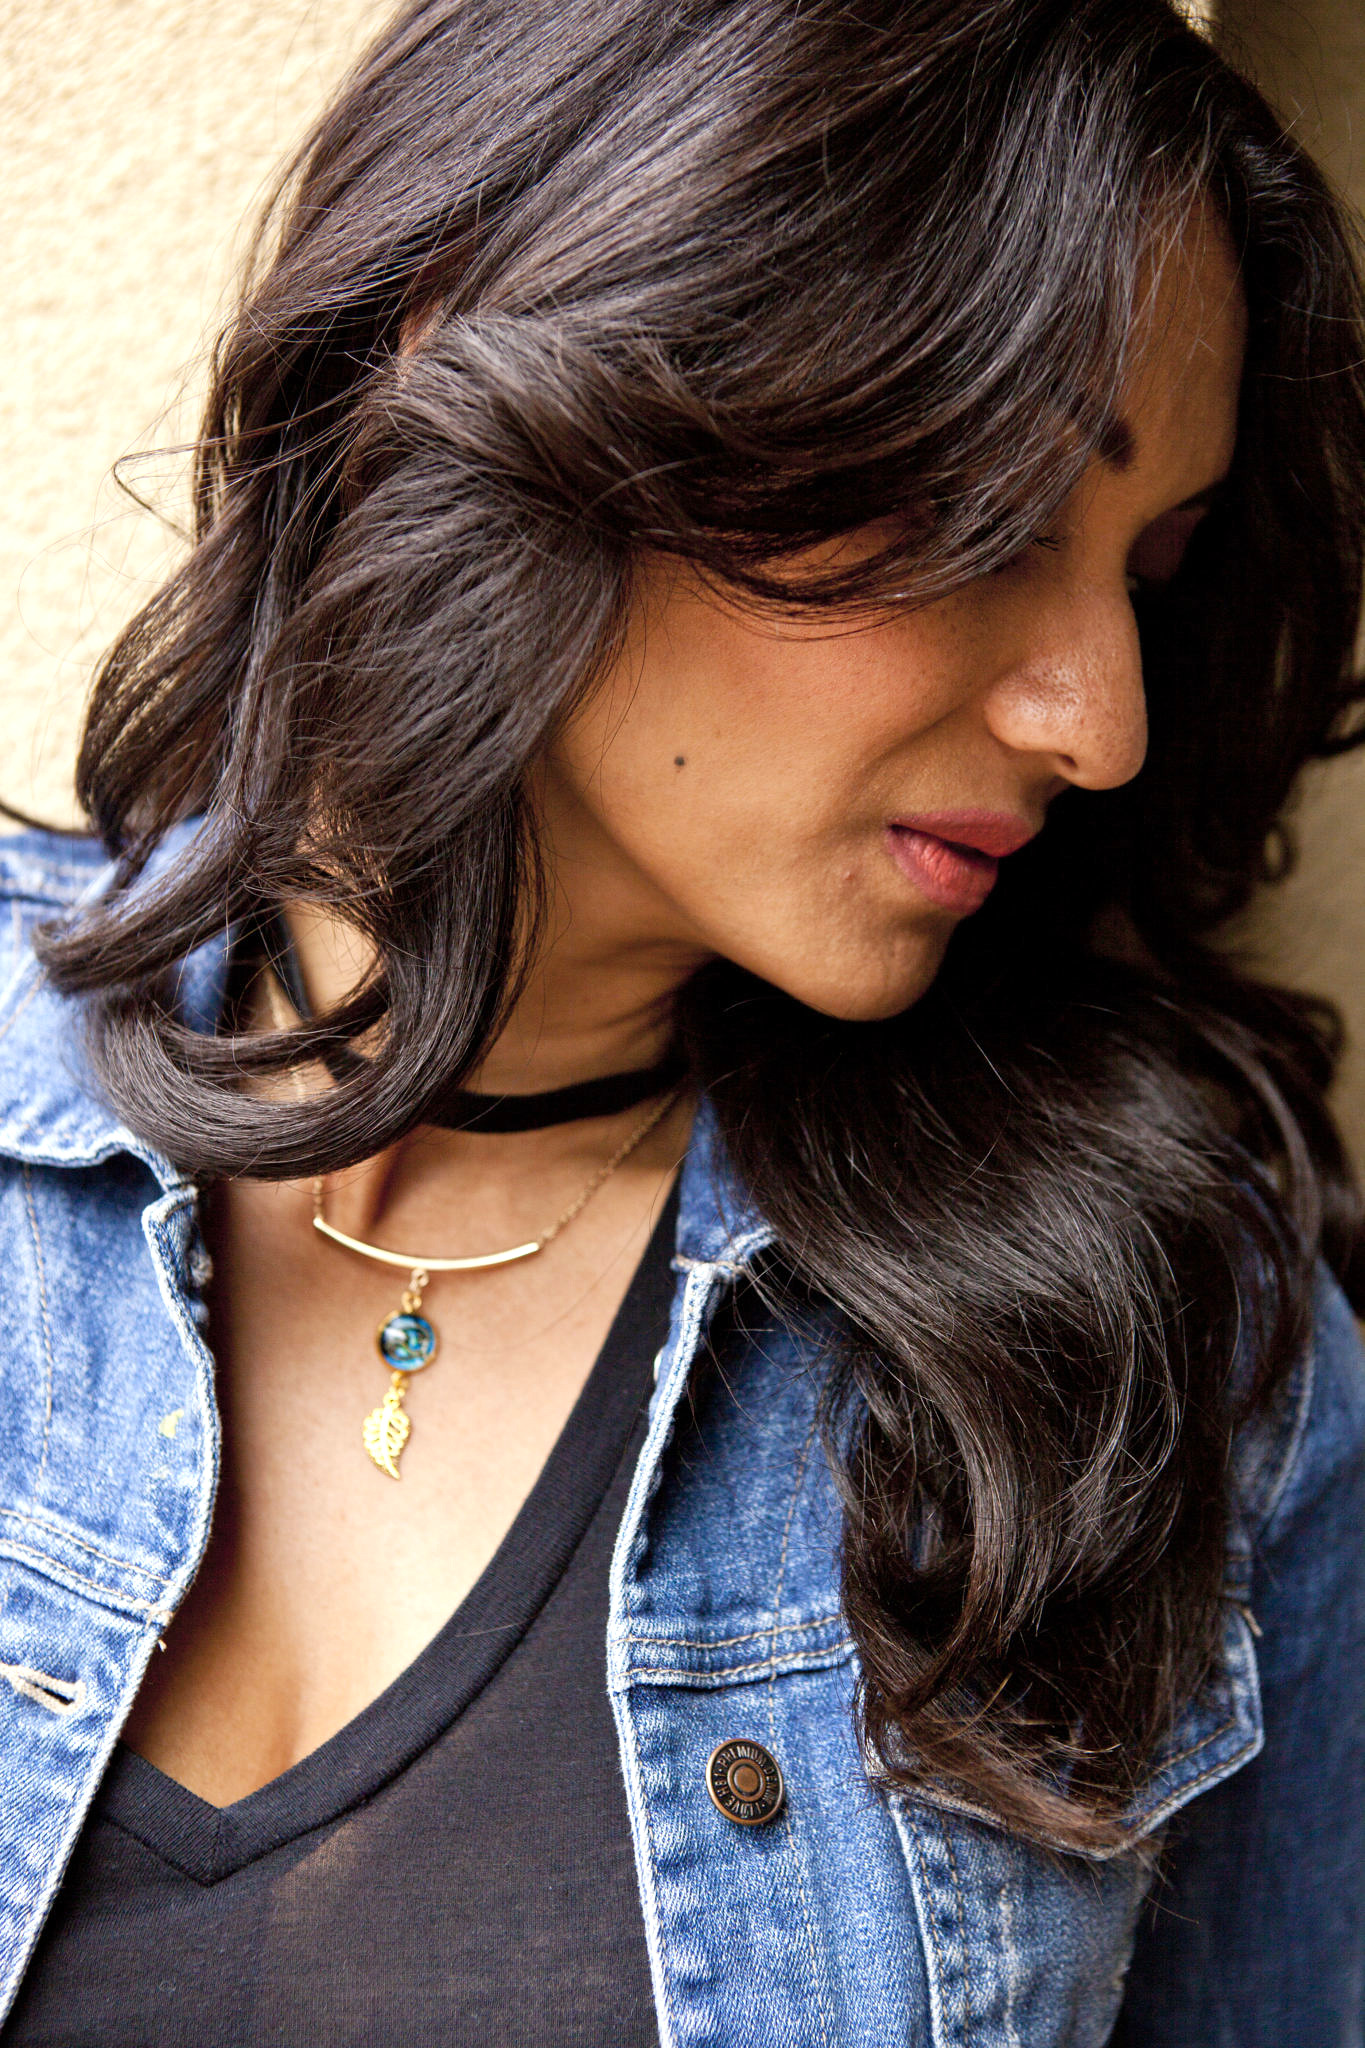 debbie-savage-zodiac-choker-necklace-2